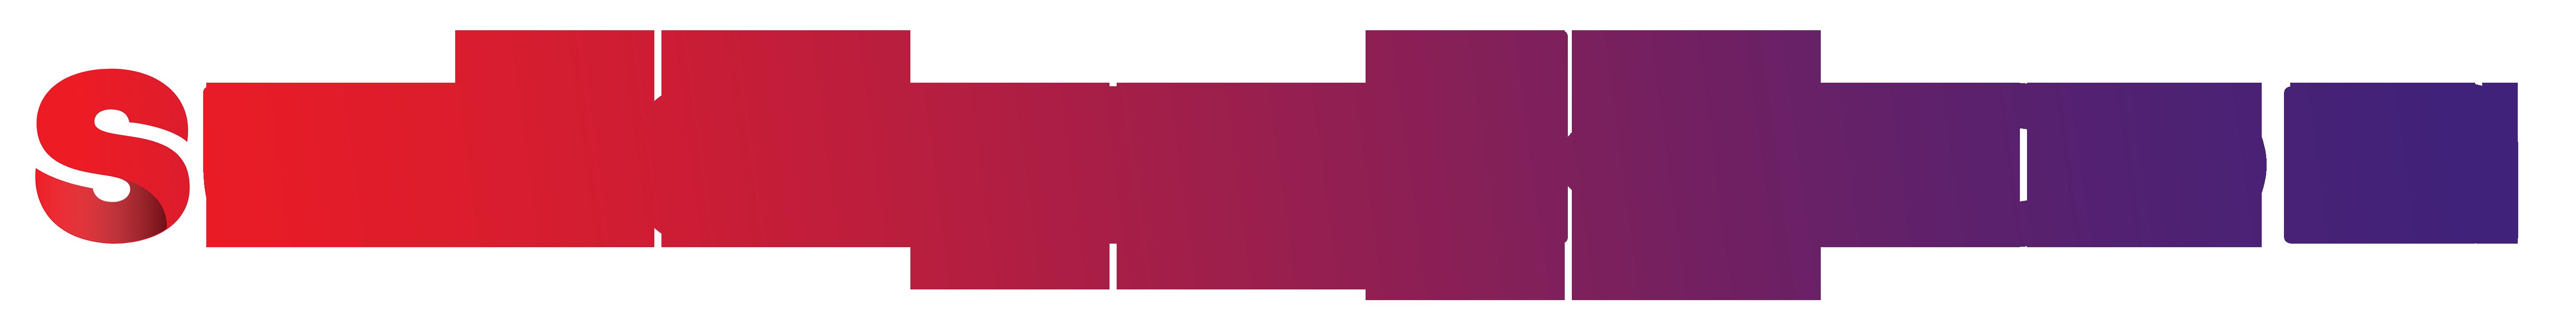 Suara Bangka